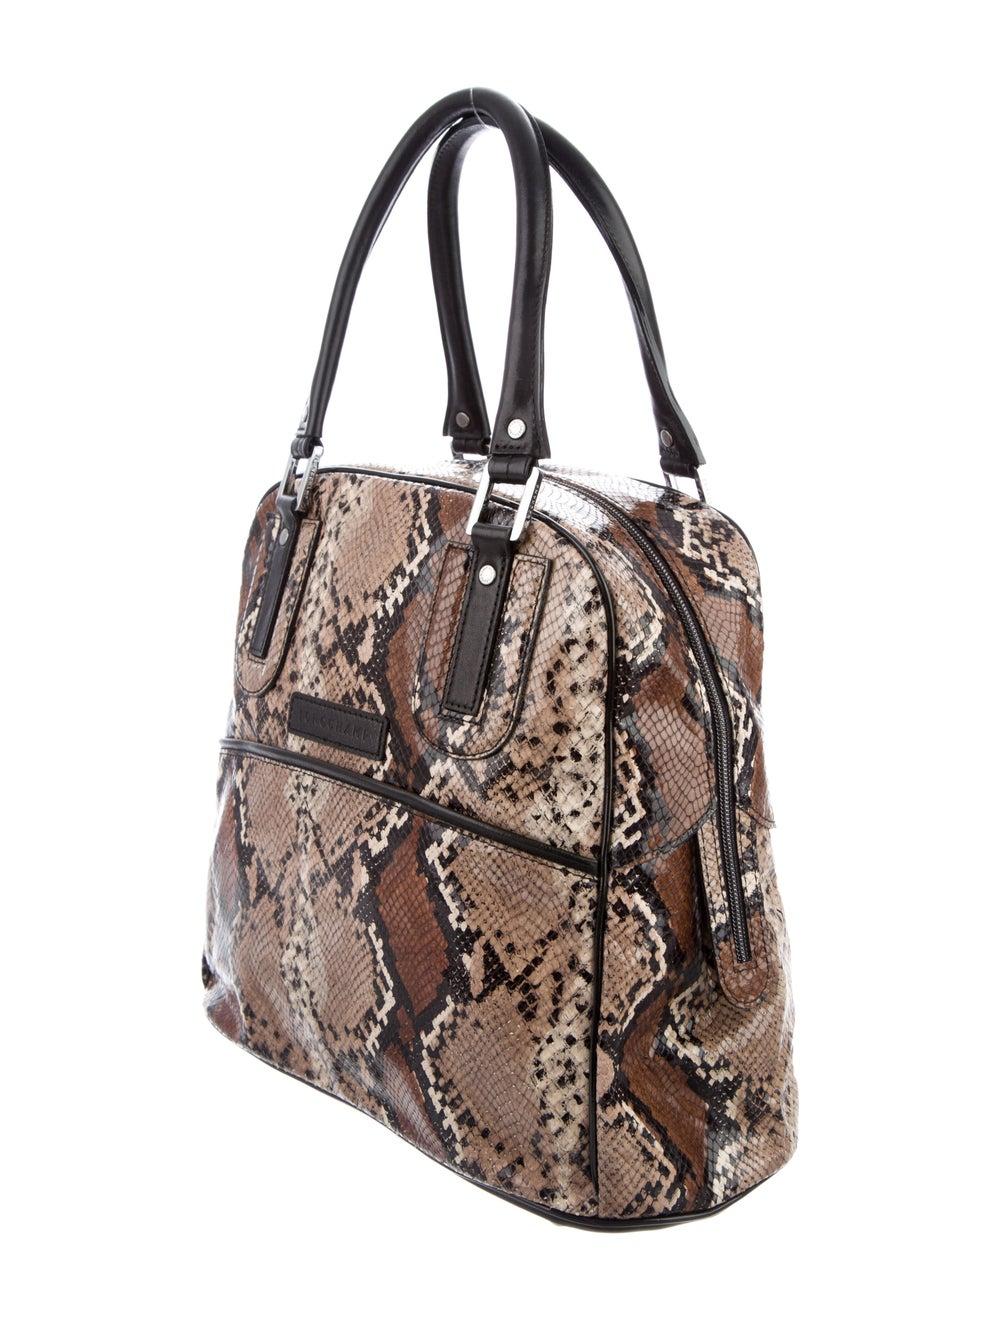 Longchamp Python Leather Tote Brown - image 3